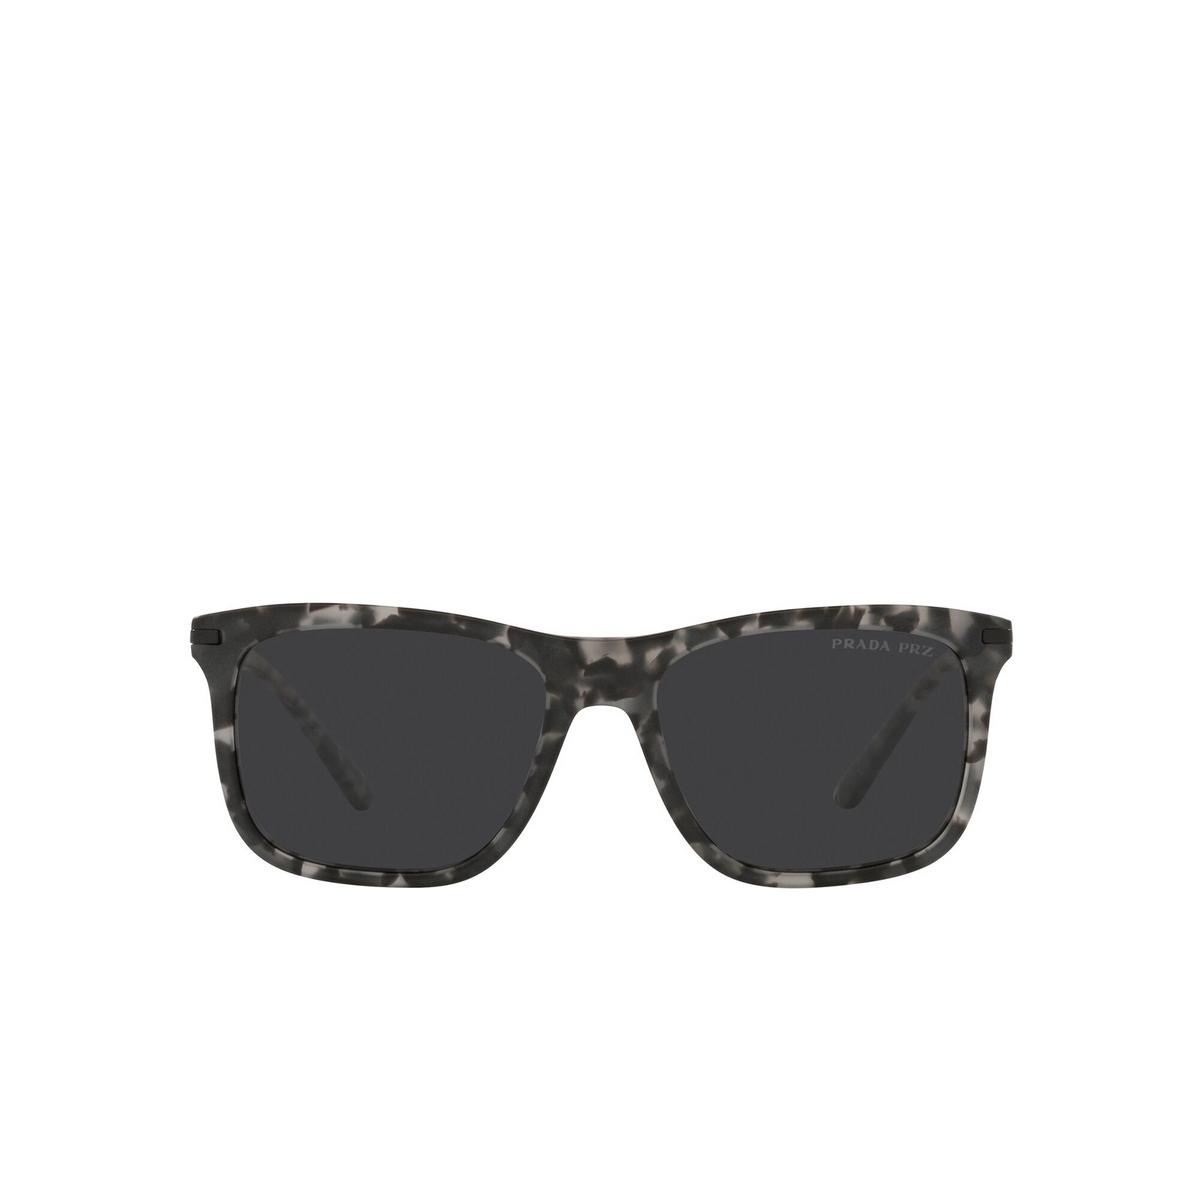 Prada® Rectangle Sunglasses: PR 18WS color Matte Dark Grey Tortoise VH308G - front view.